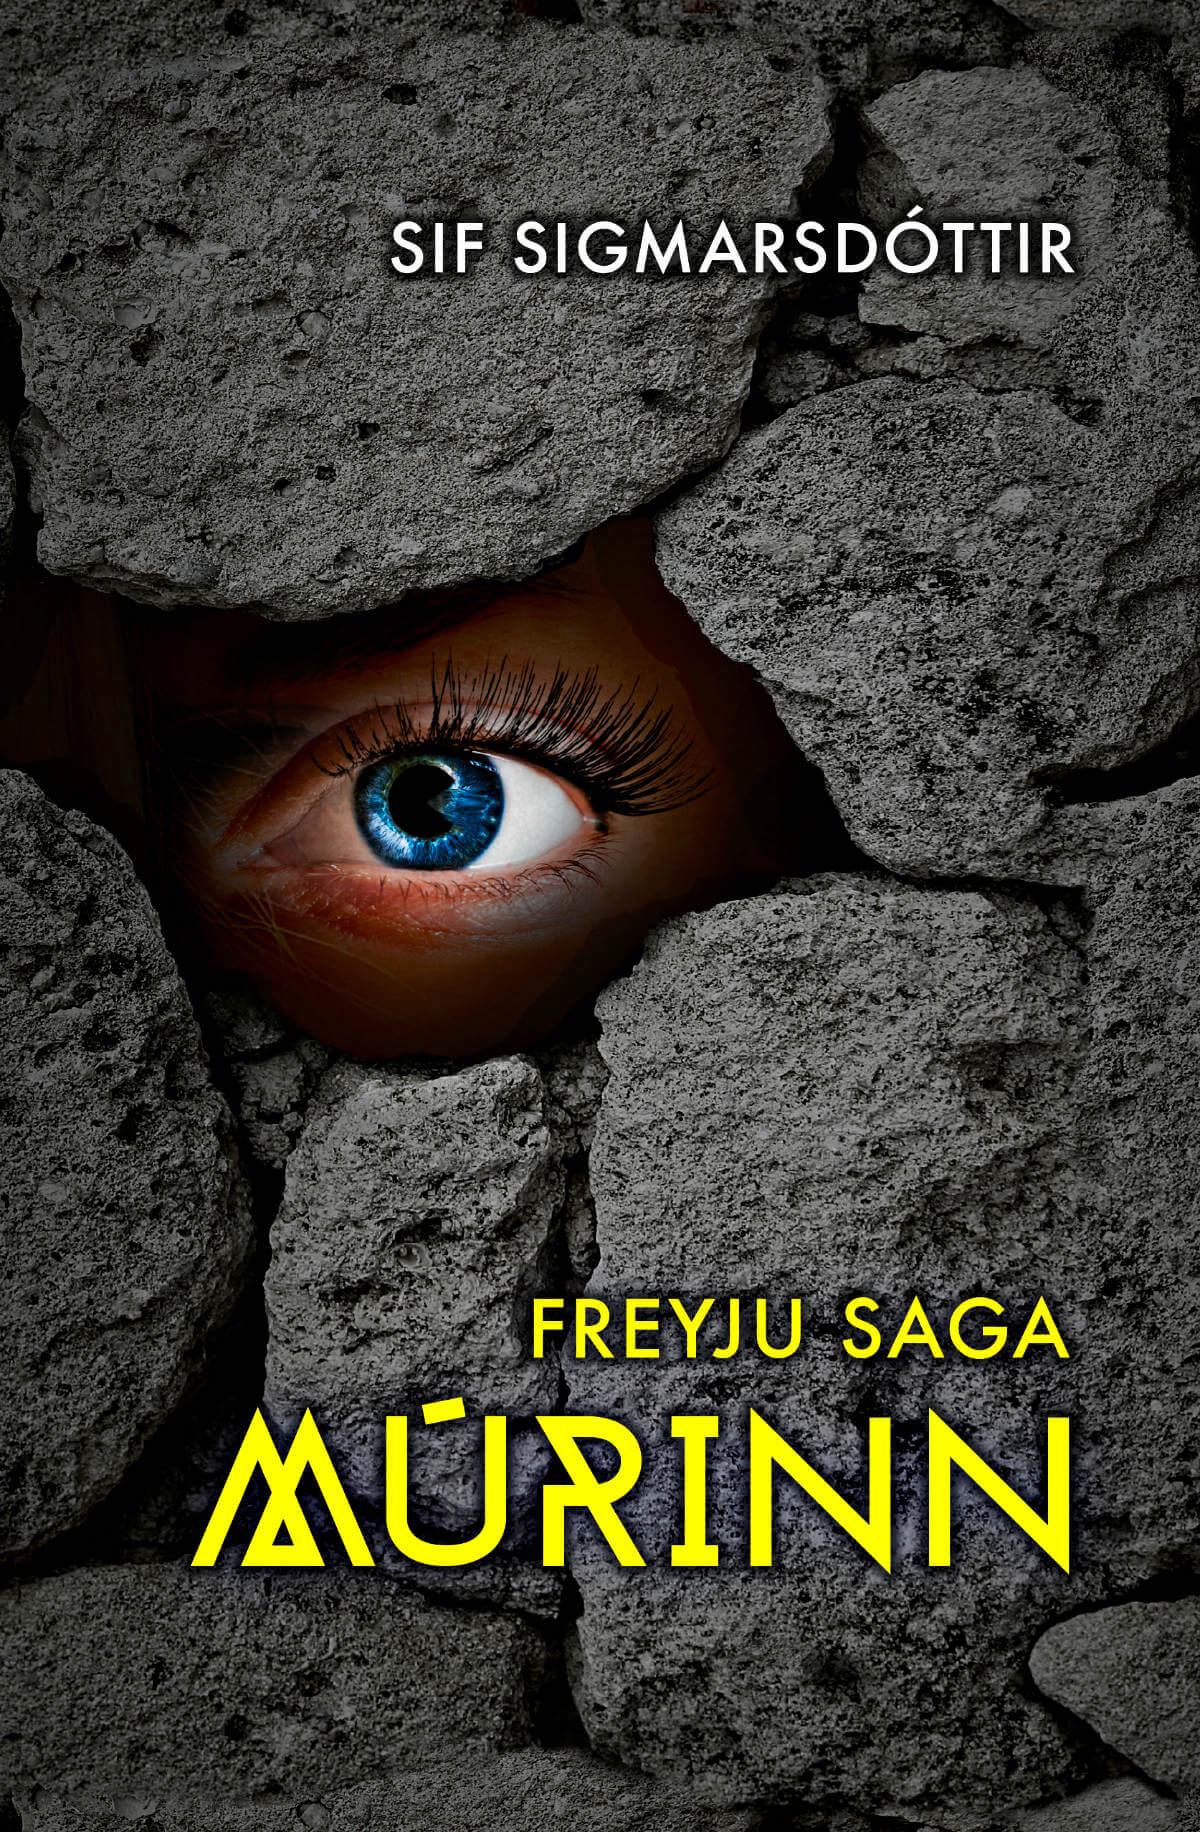 Freyju saga – Múrinn